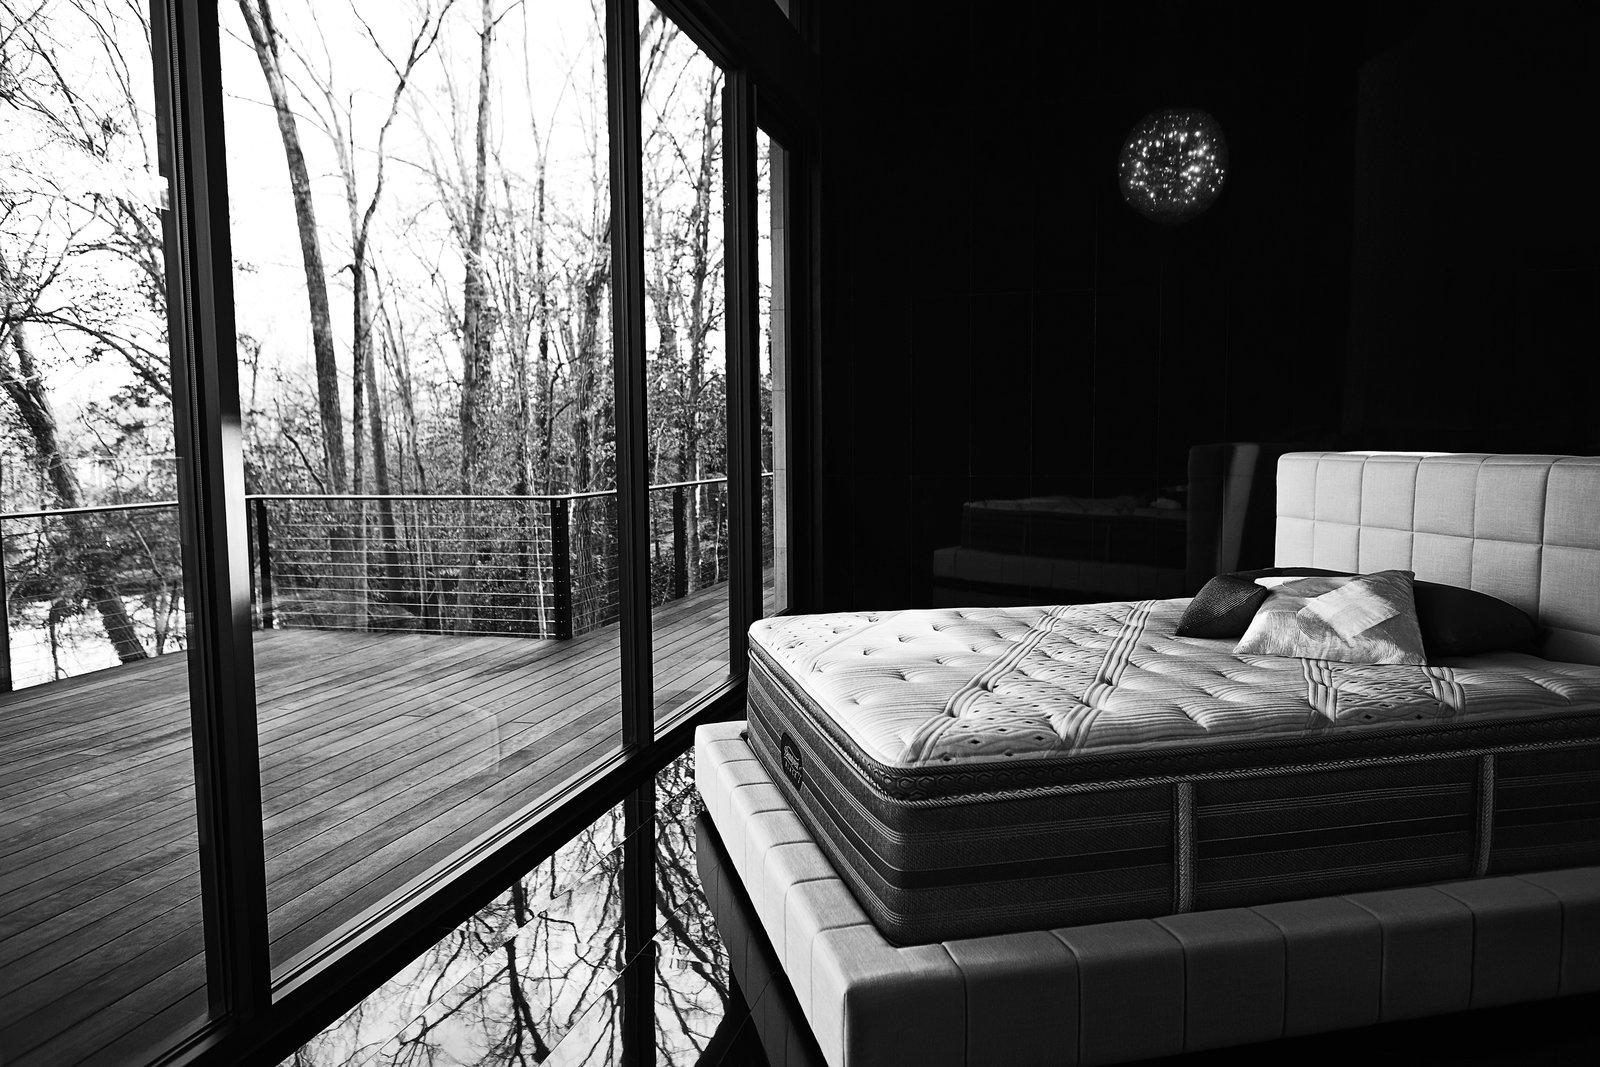 Beautyrest black mattress in situ.  Photo 1 of 3 in Sleep: The Ultimate Luxury